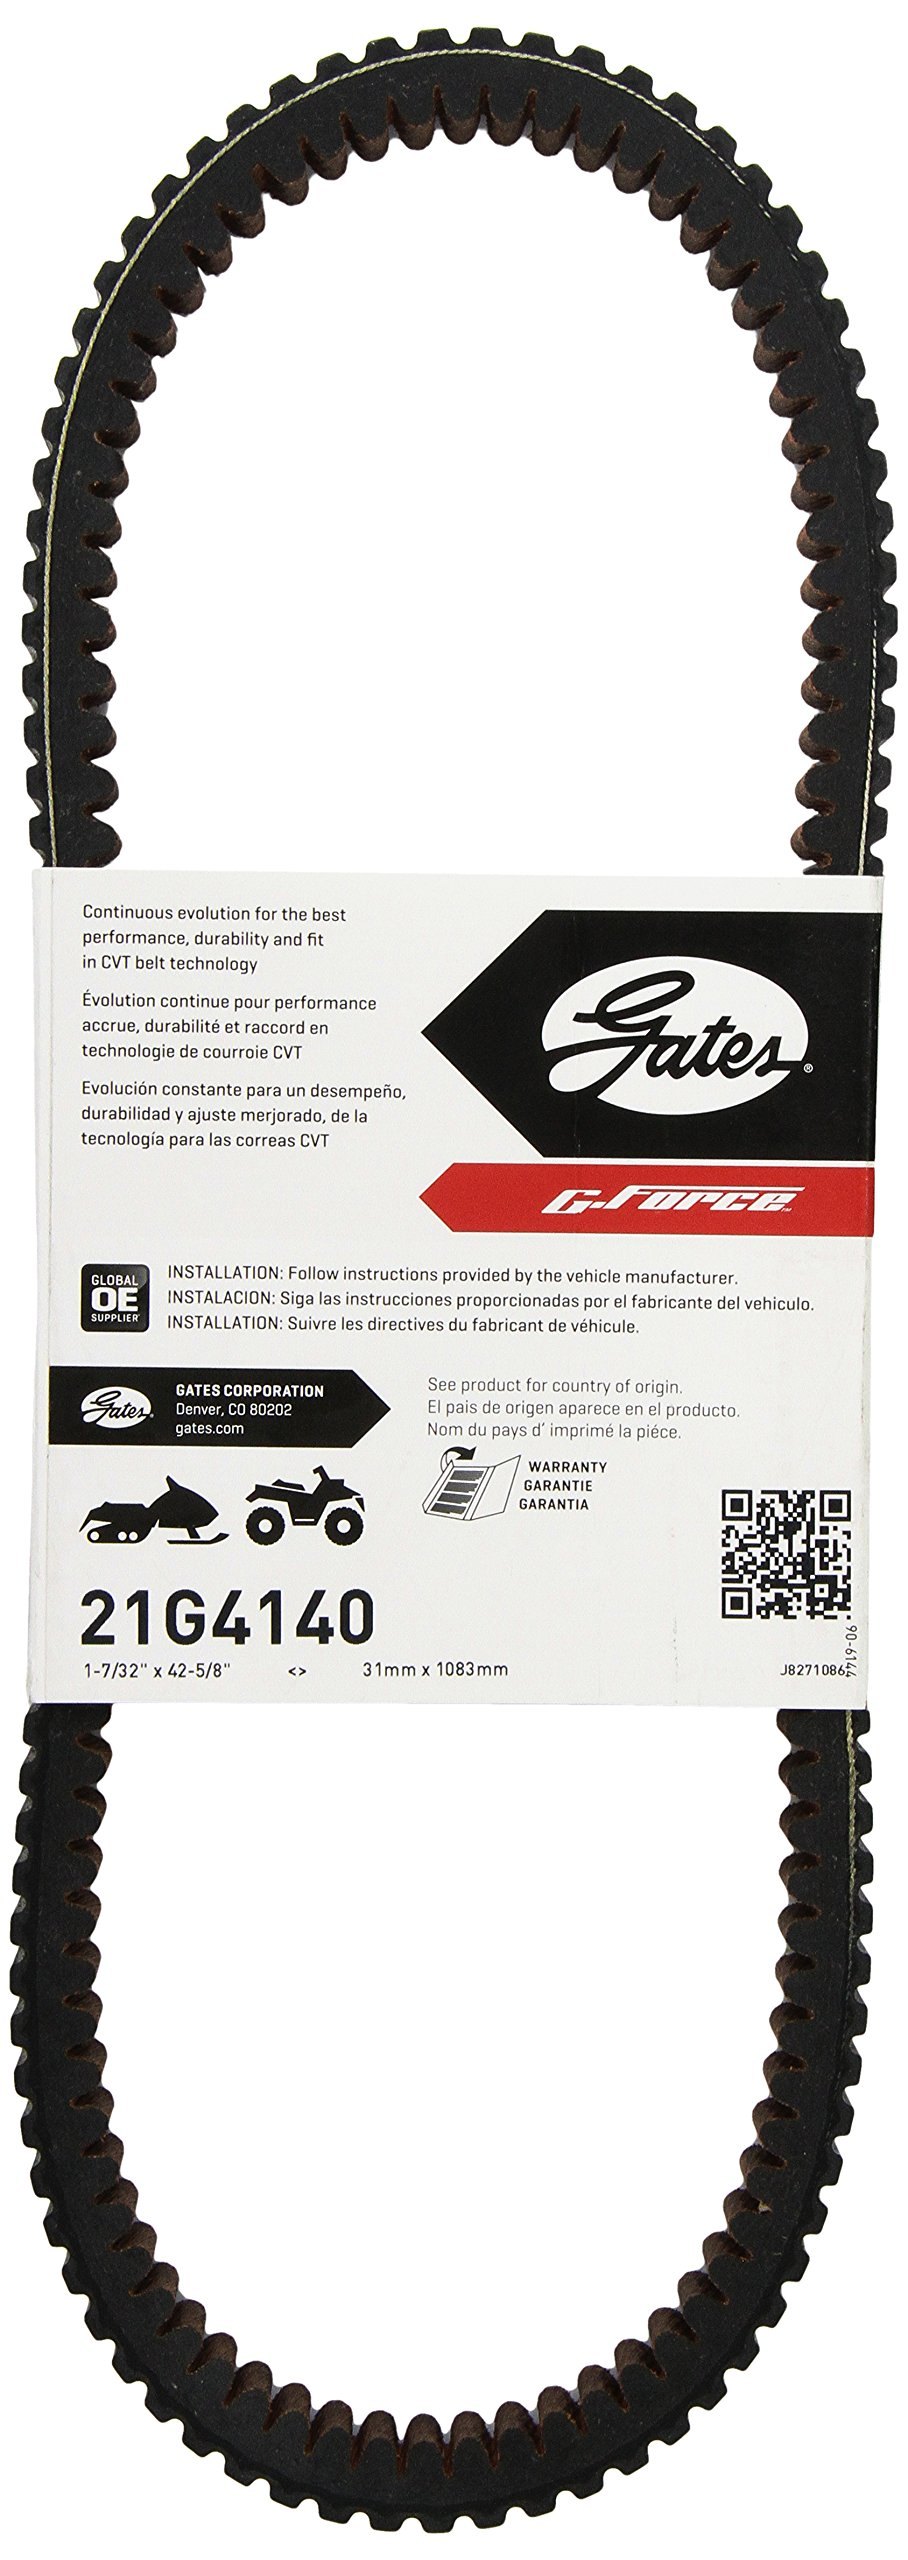 Genuine OEM Drive Belt for Polaris 2012-2014 RZR 900 /& RZR XP 1000 3211148